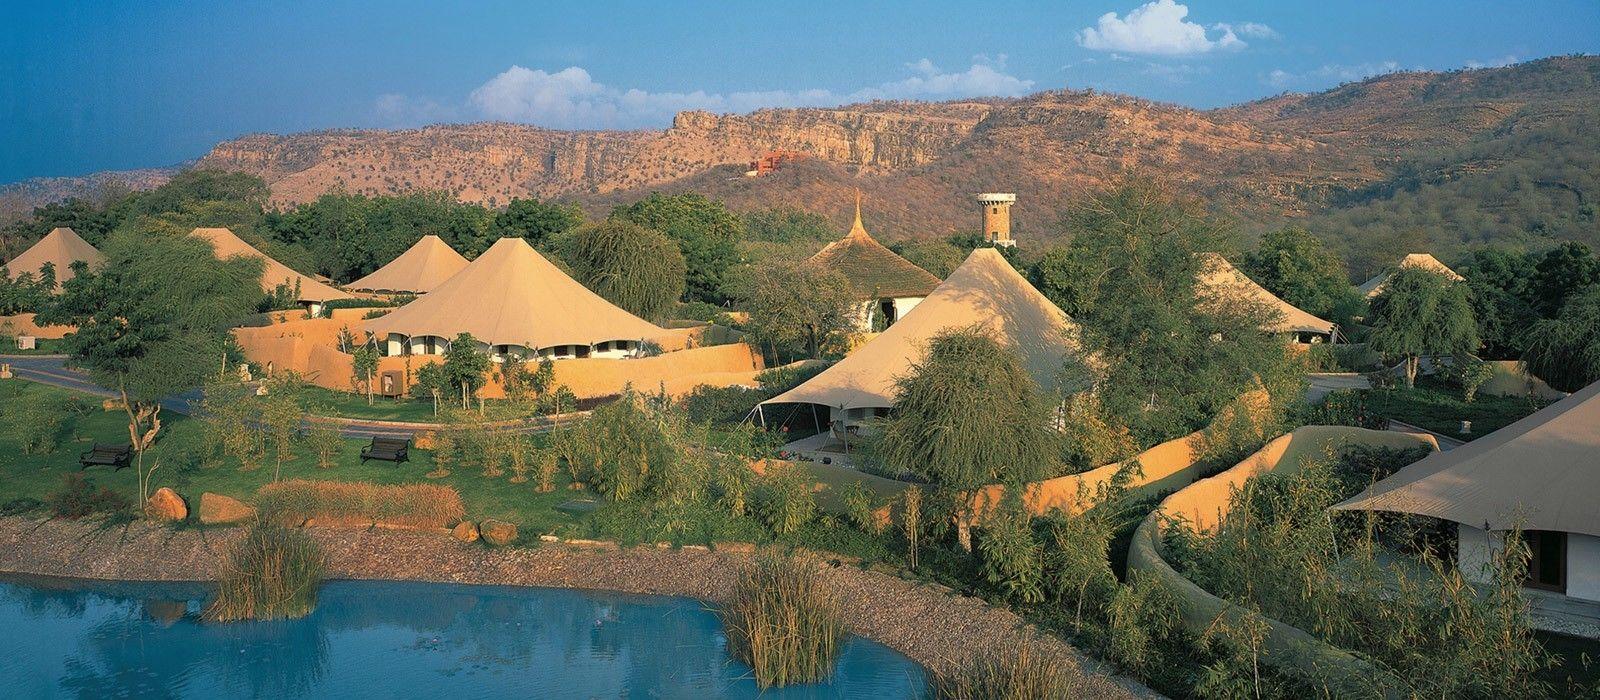 Oberoi Exklusiv: Royales Rajasthan und Safari Abenteuer Urlaub 4